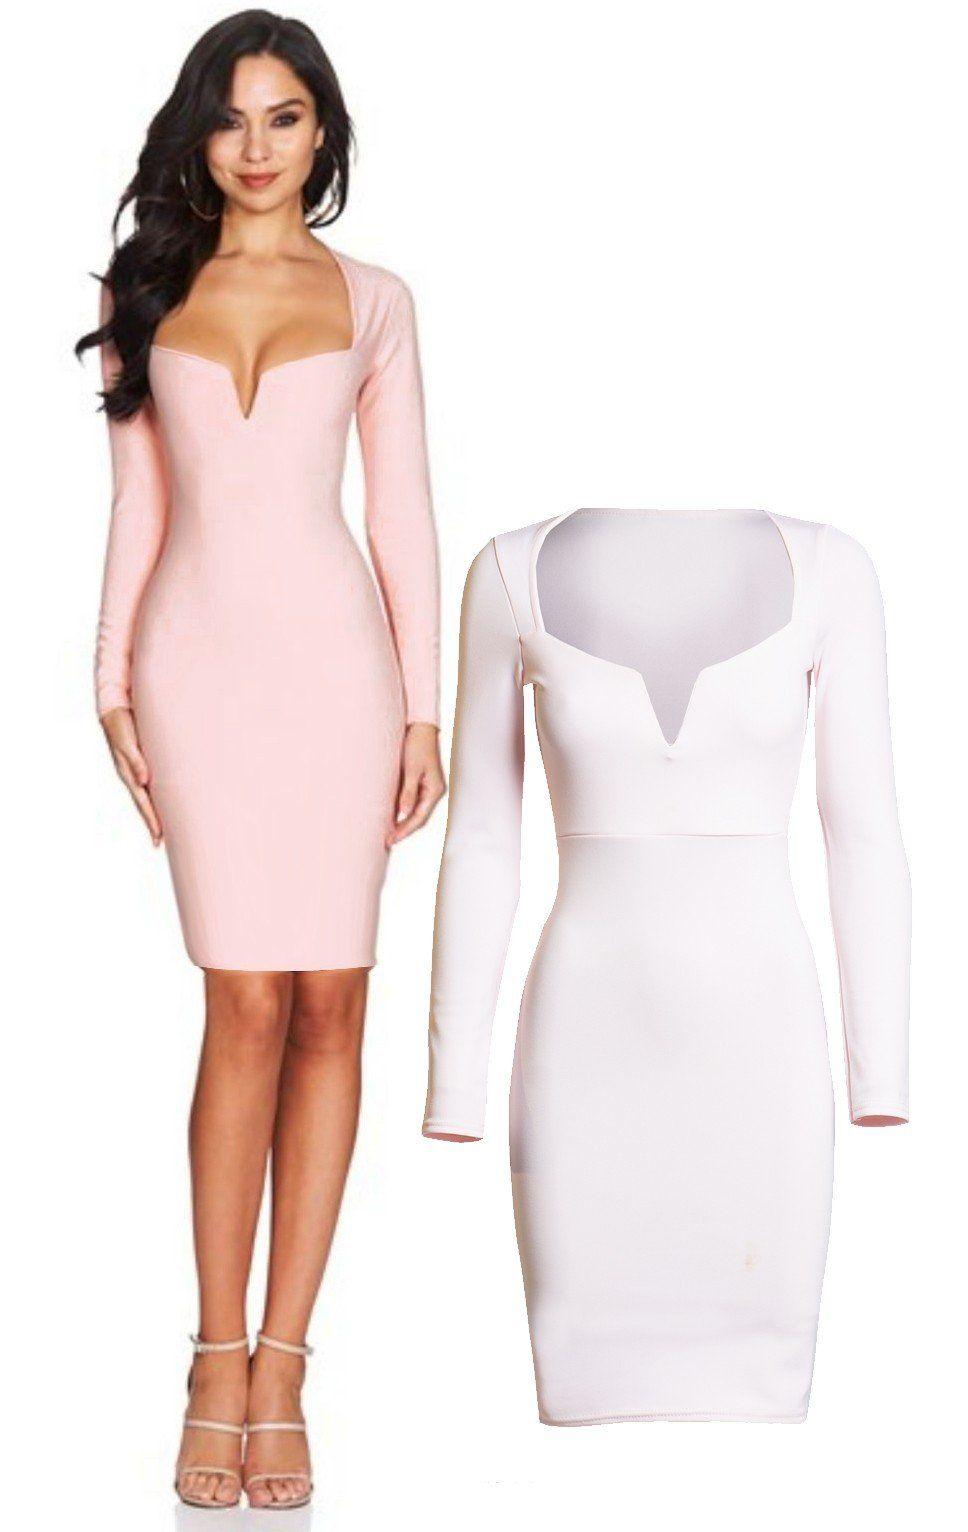 161c41e413 Low Plunge Neckline Dress